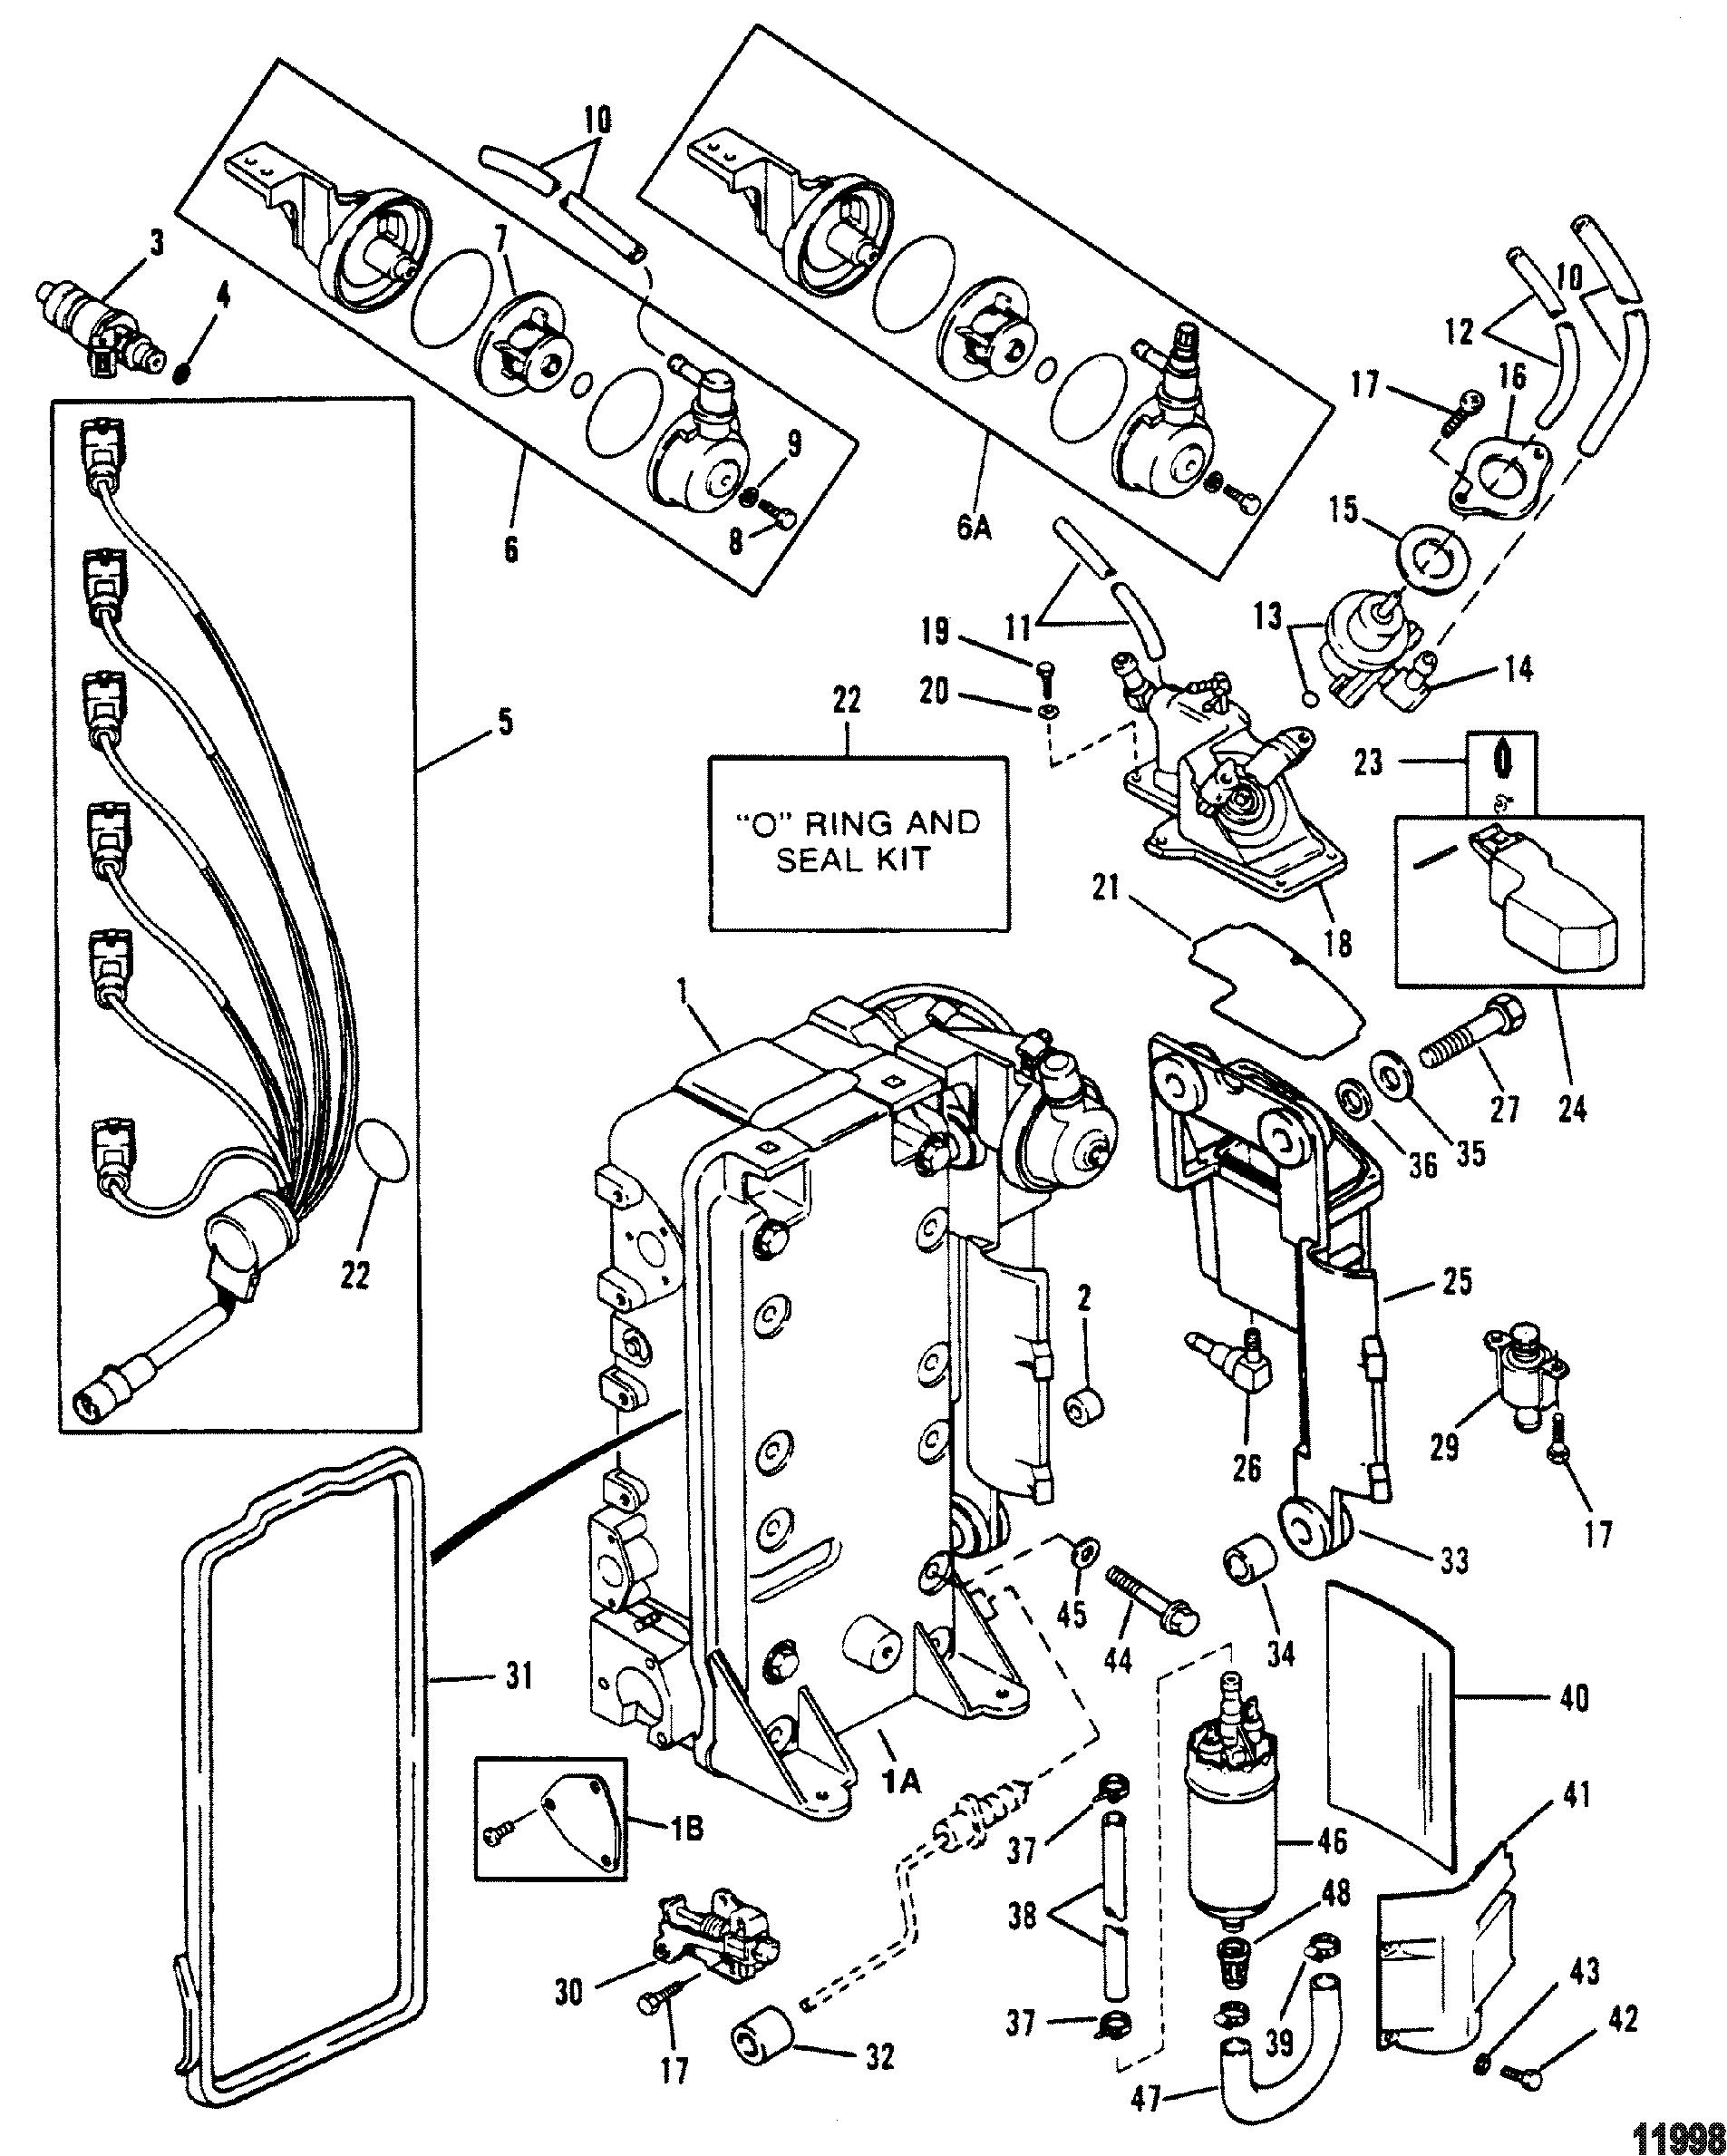 Mercury 150 V6 Wiring Diagrams Worksheet And Diagram 60 Hp 1994 Mariner Harness Detailed Schematics Rh Jvpacks Com Outboard